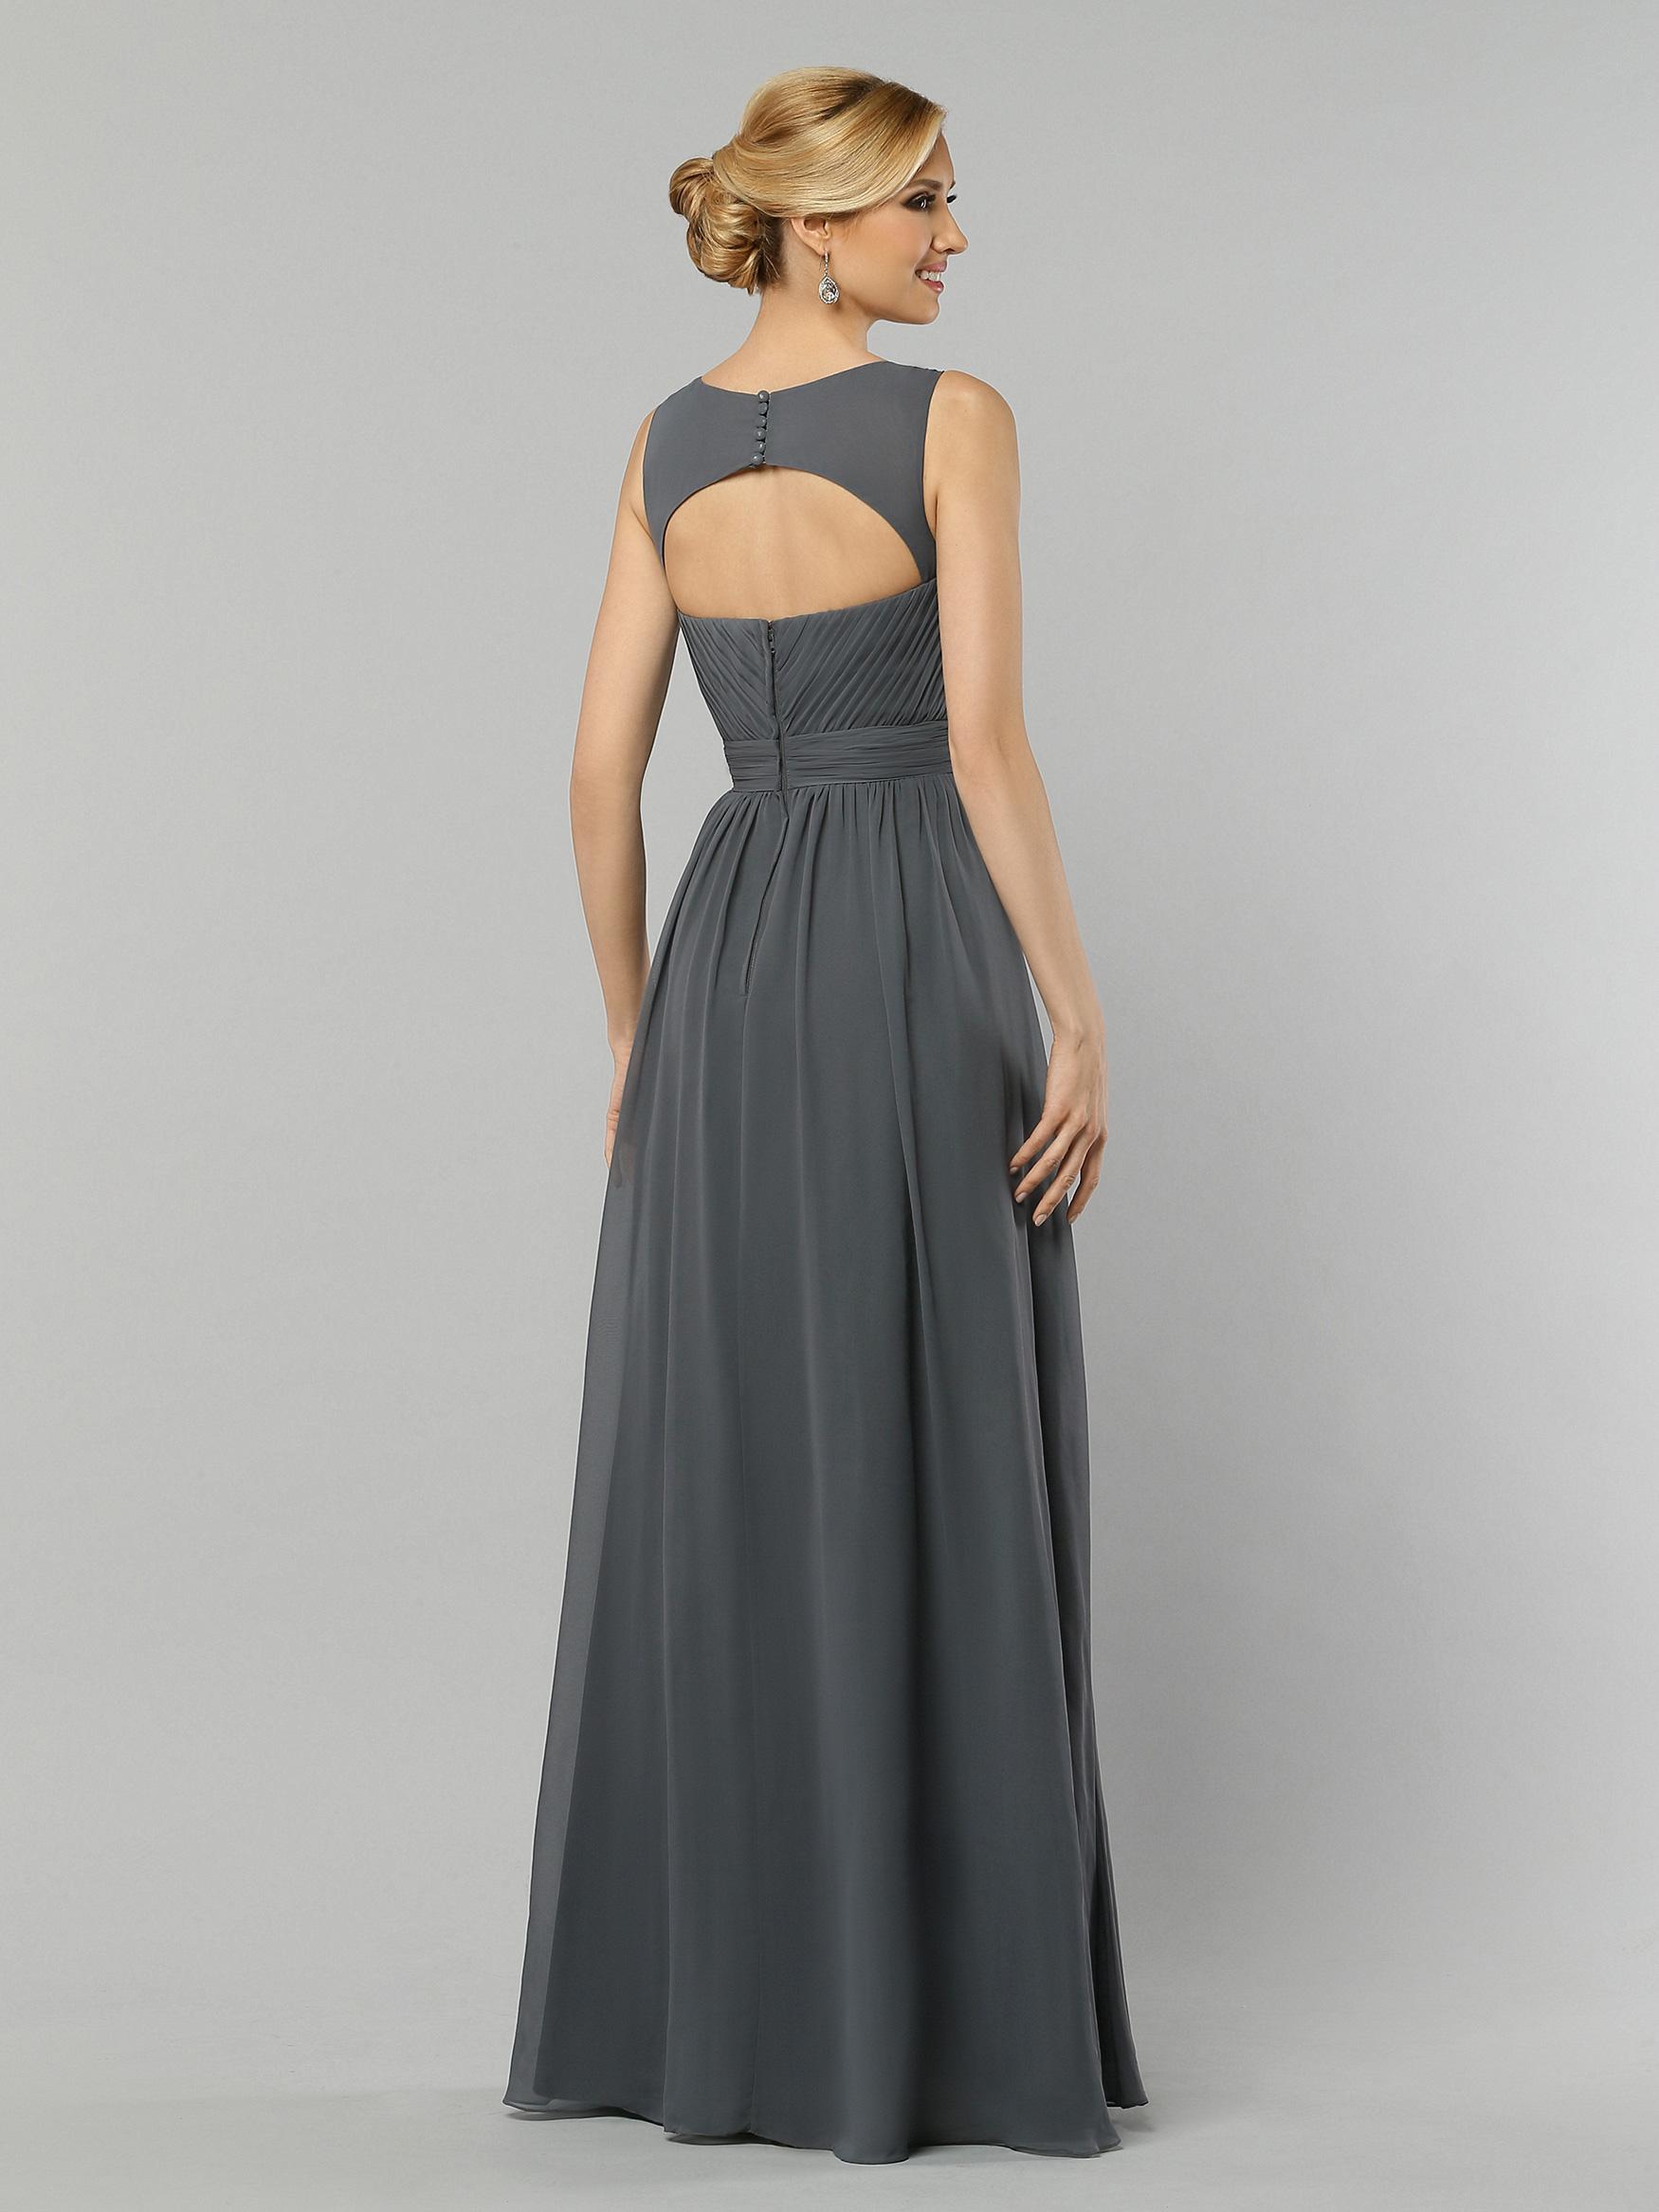 Style #60323